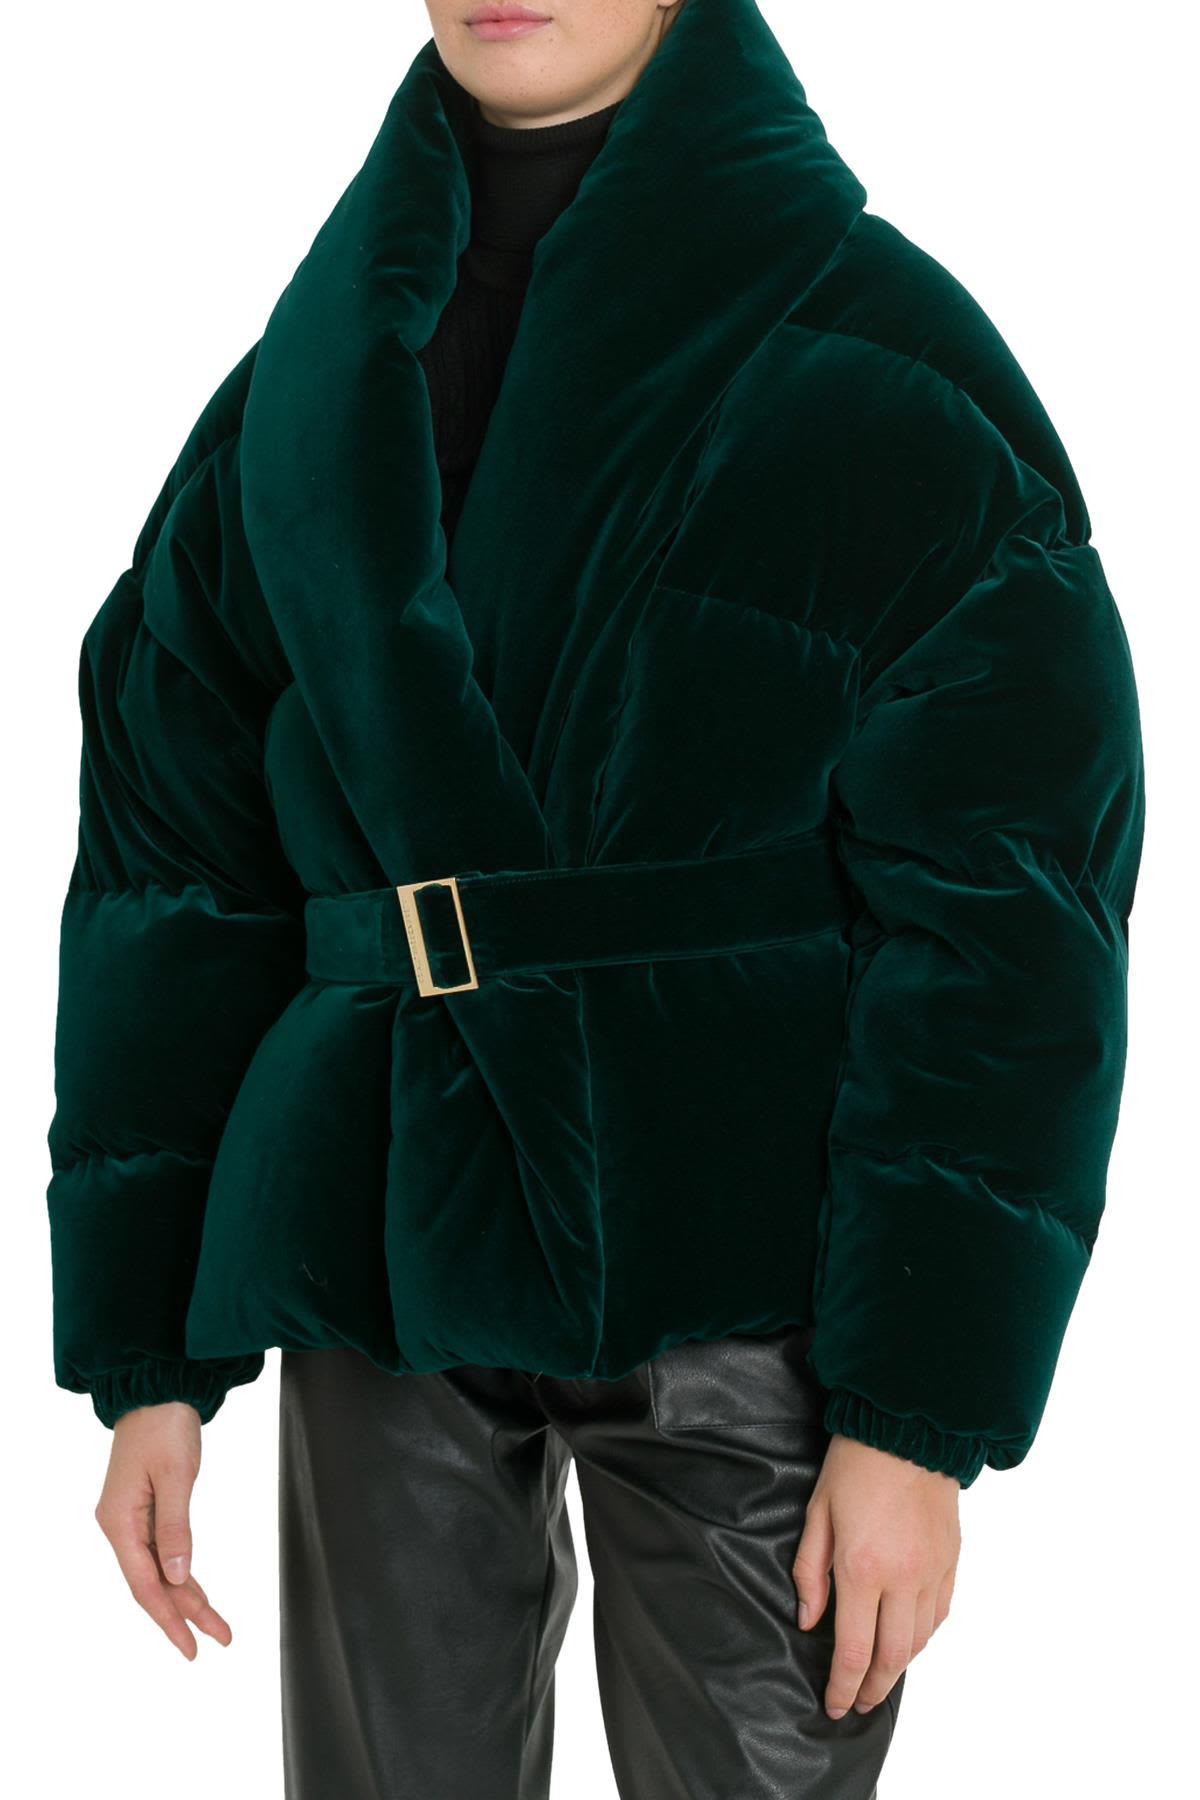 Alexandre Vauthier Clothing PIUMINO IN VELLUTO